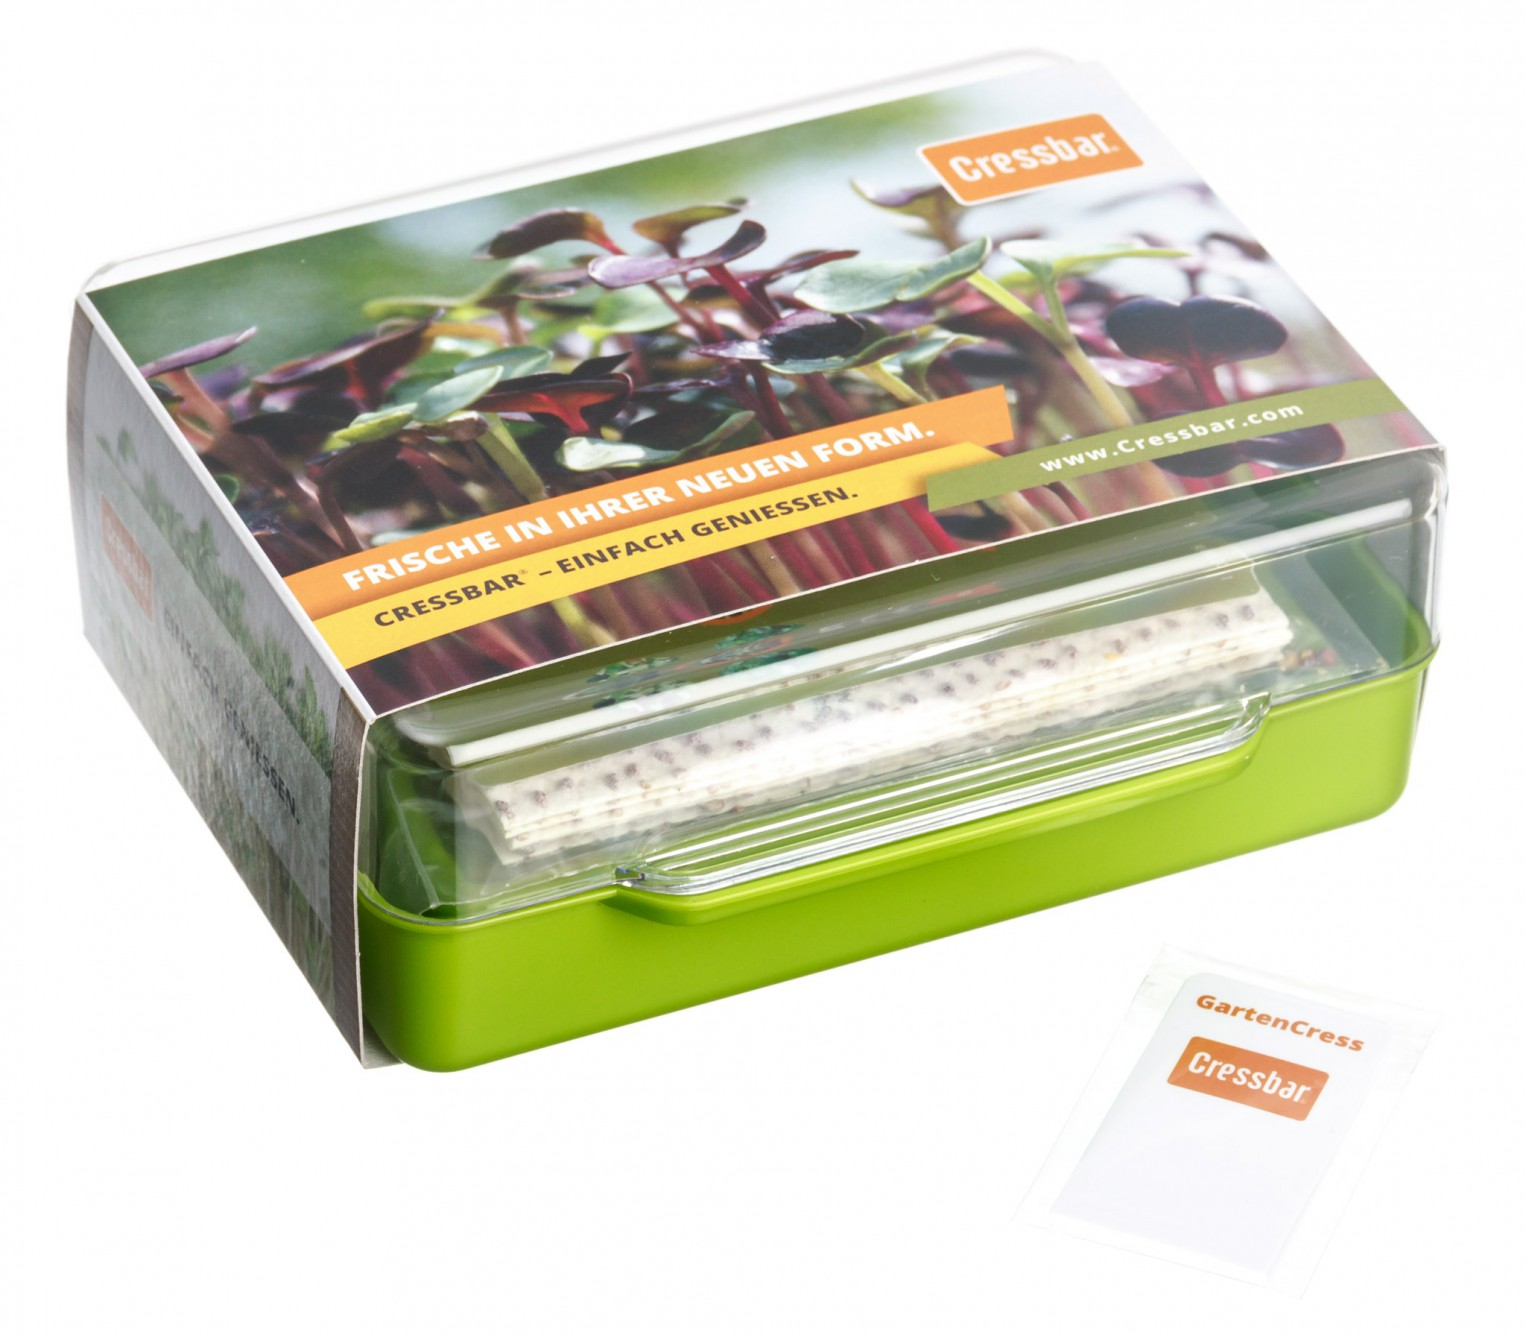 Cressbar®-Starter Kit Doppelpack Bild 3